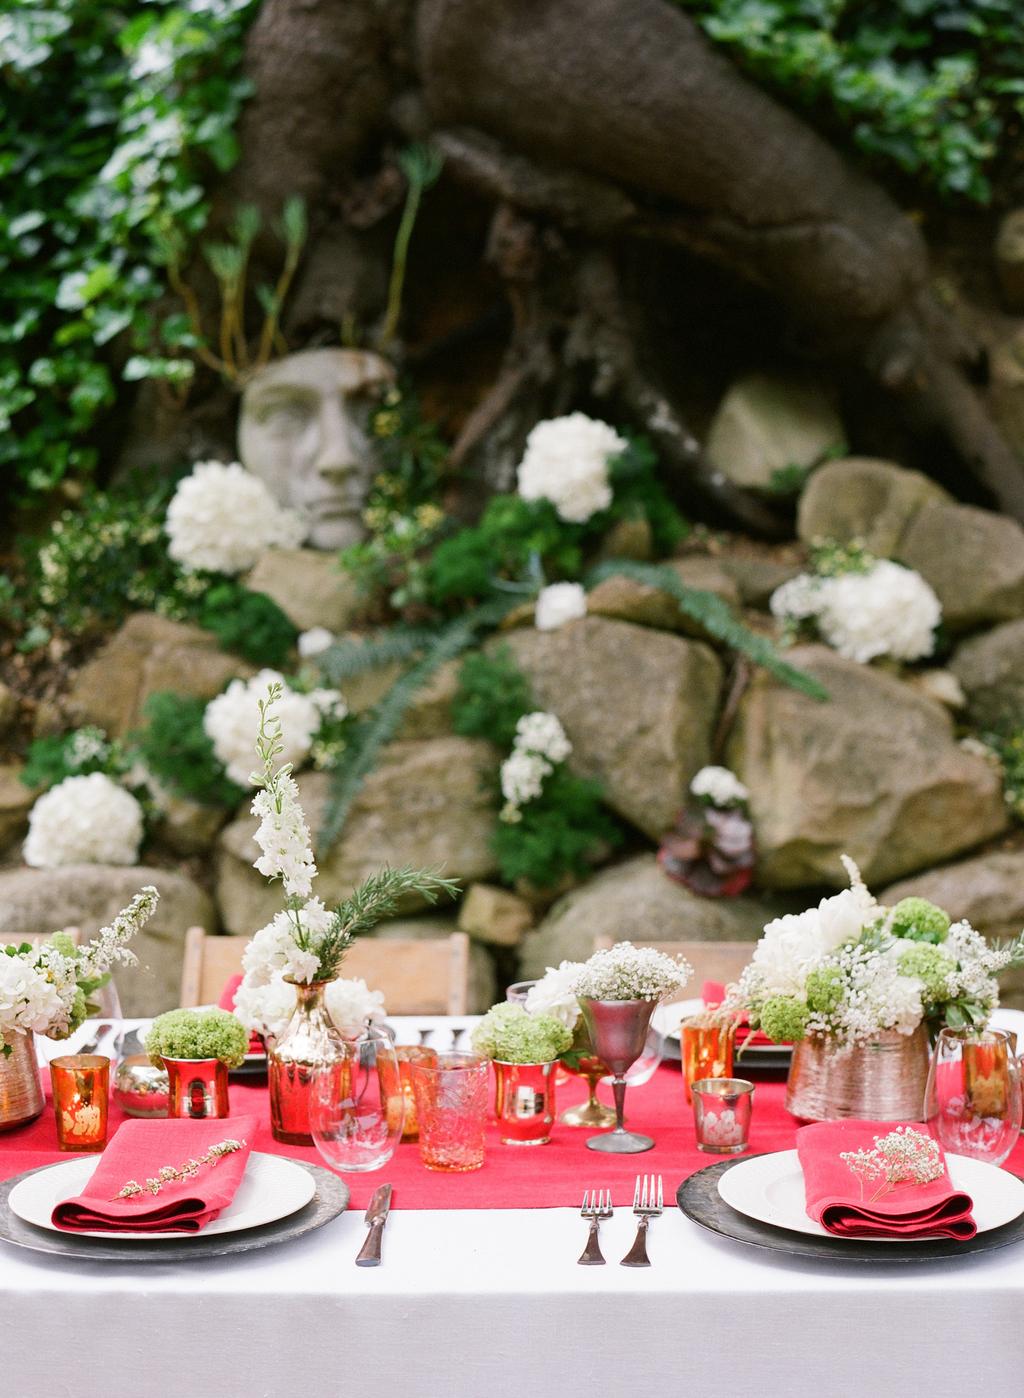 Styled-wedding-santa-barbara-chic-beaux-arts-photographie-italian-bohemian-wedding-venue-table-setting-red-white-flowers-antique-glass-034.full